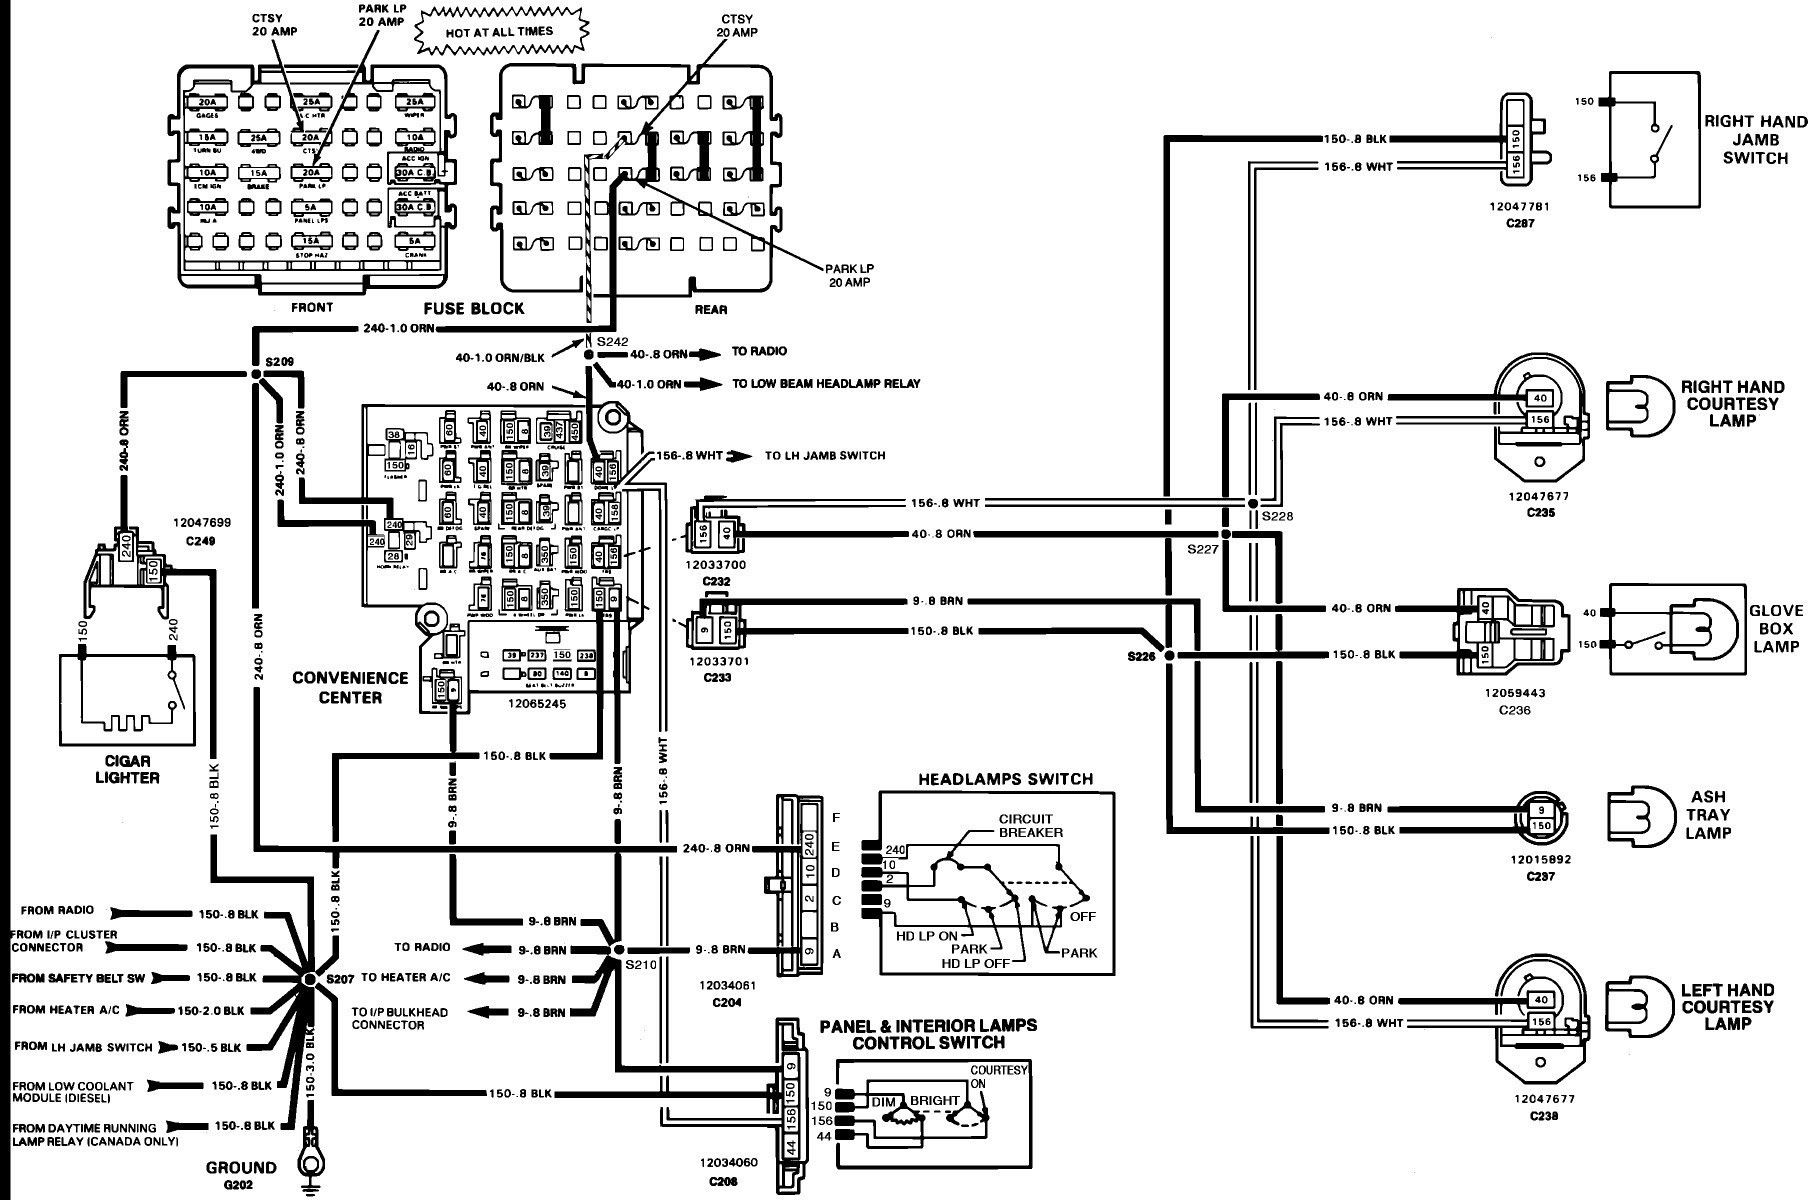 New Bmw Amplifier Wiring Diagram Diagram Diagramtemplate Diagramsample